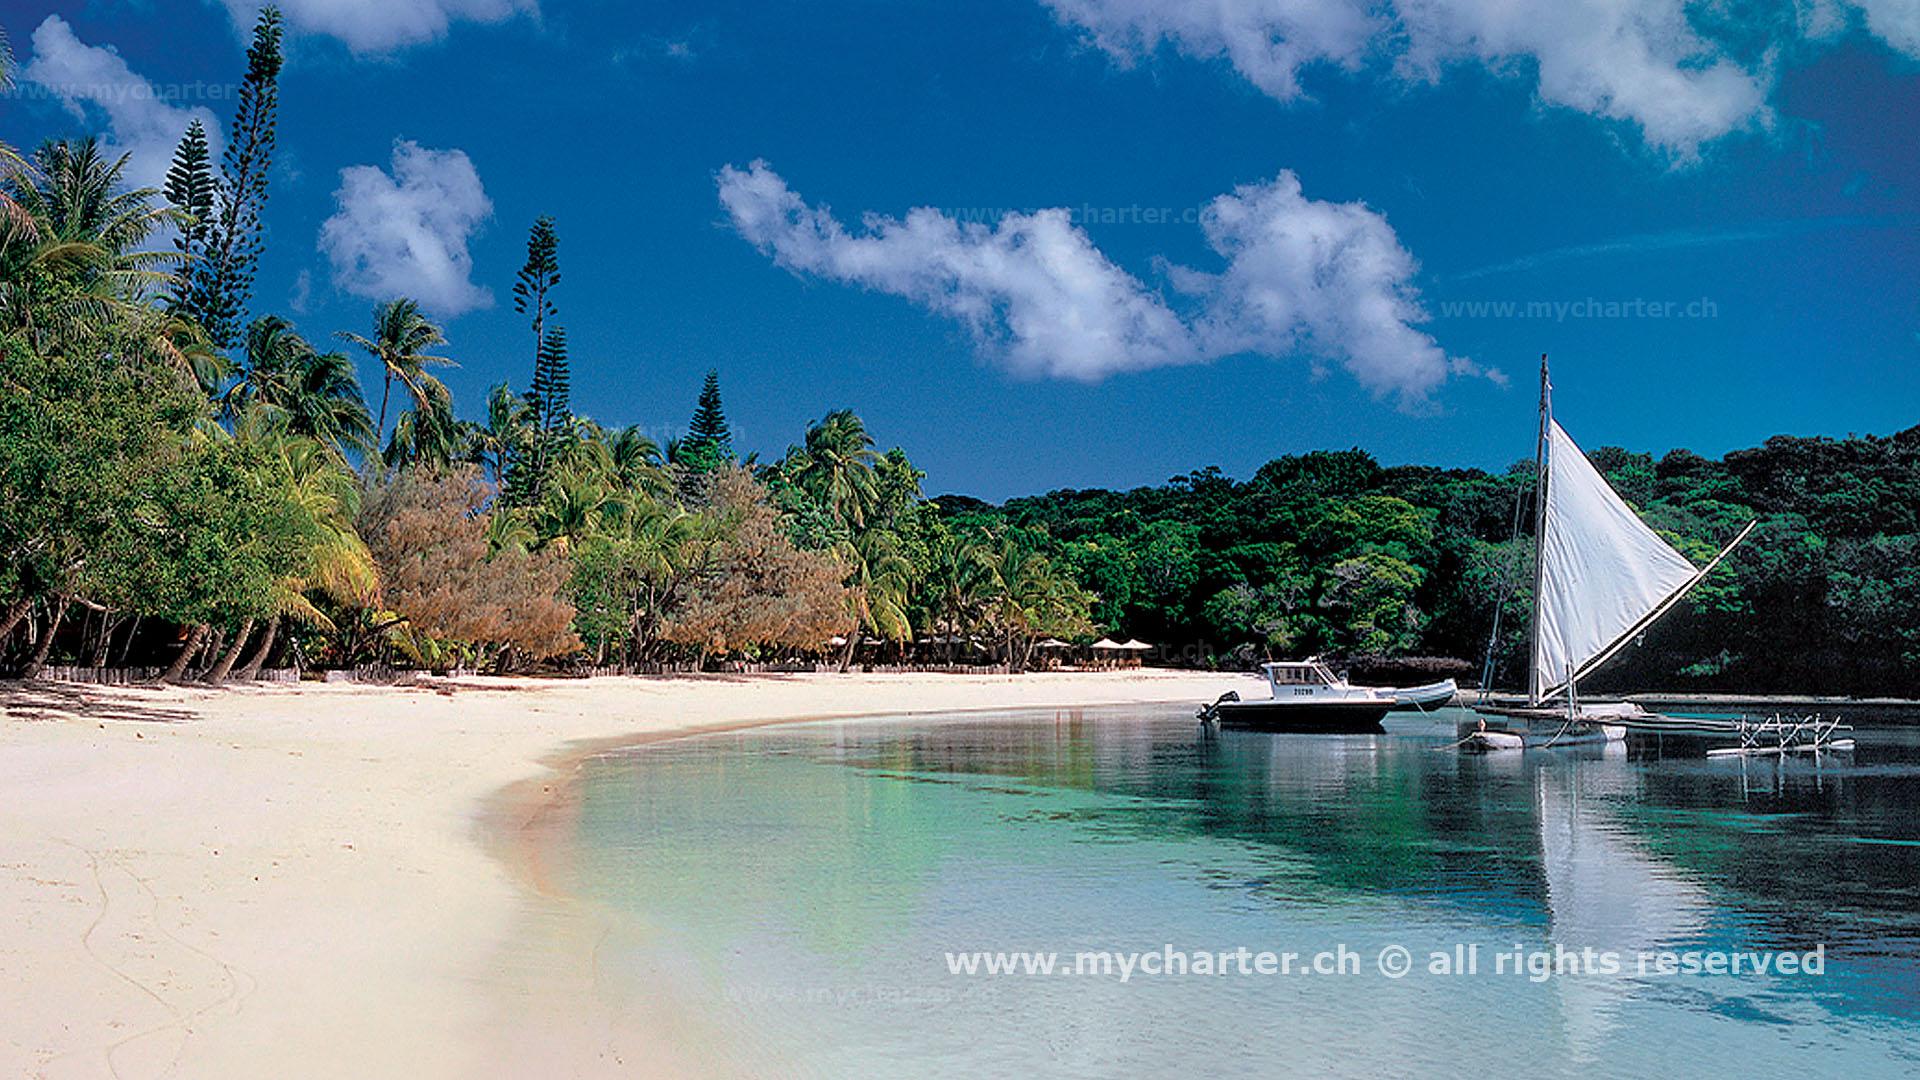 Yachtcharter Südesee - Neukaledonien - Baie de Canumera